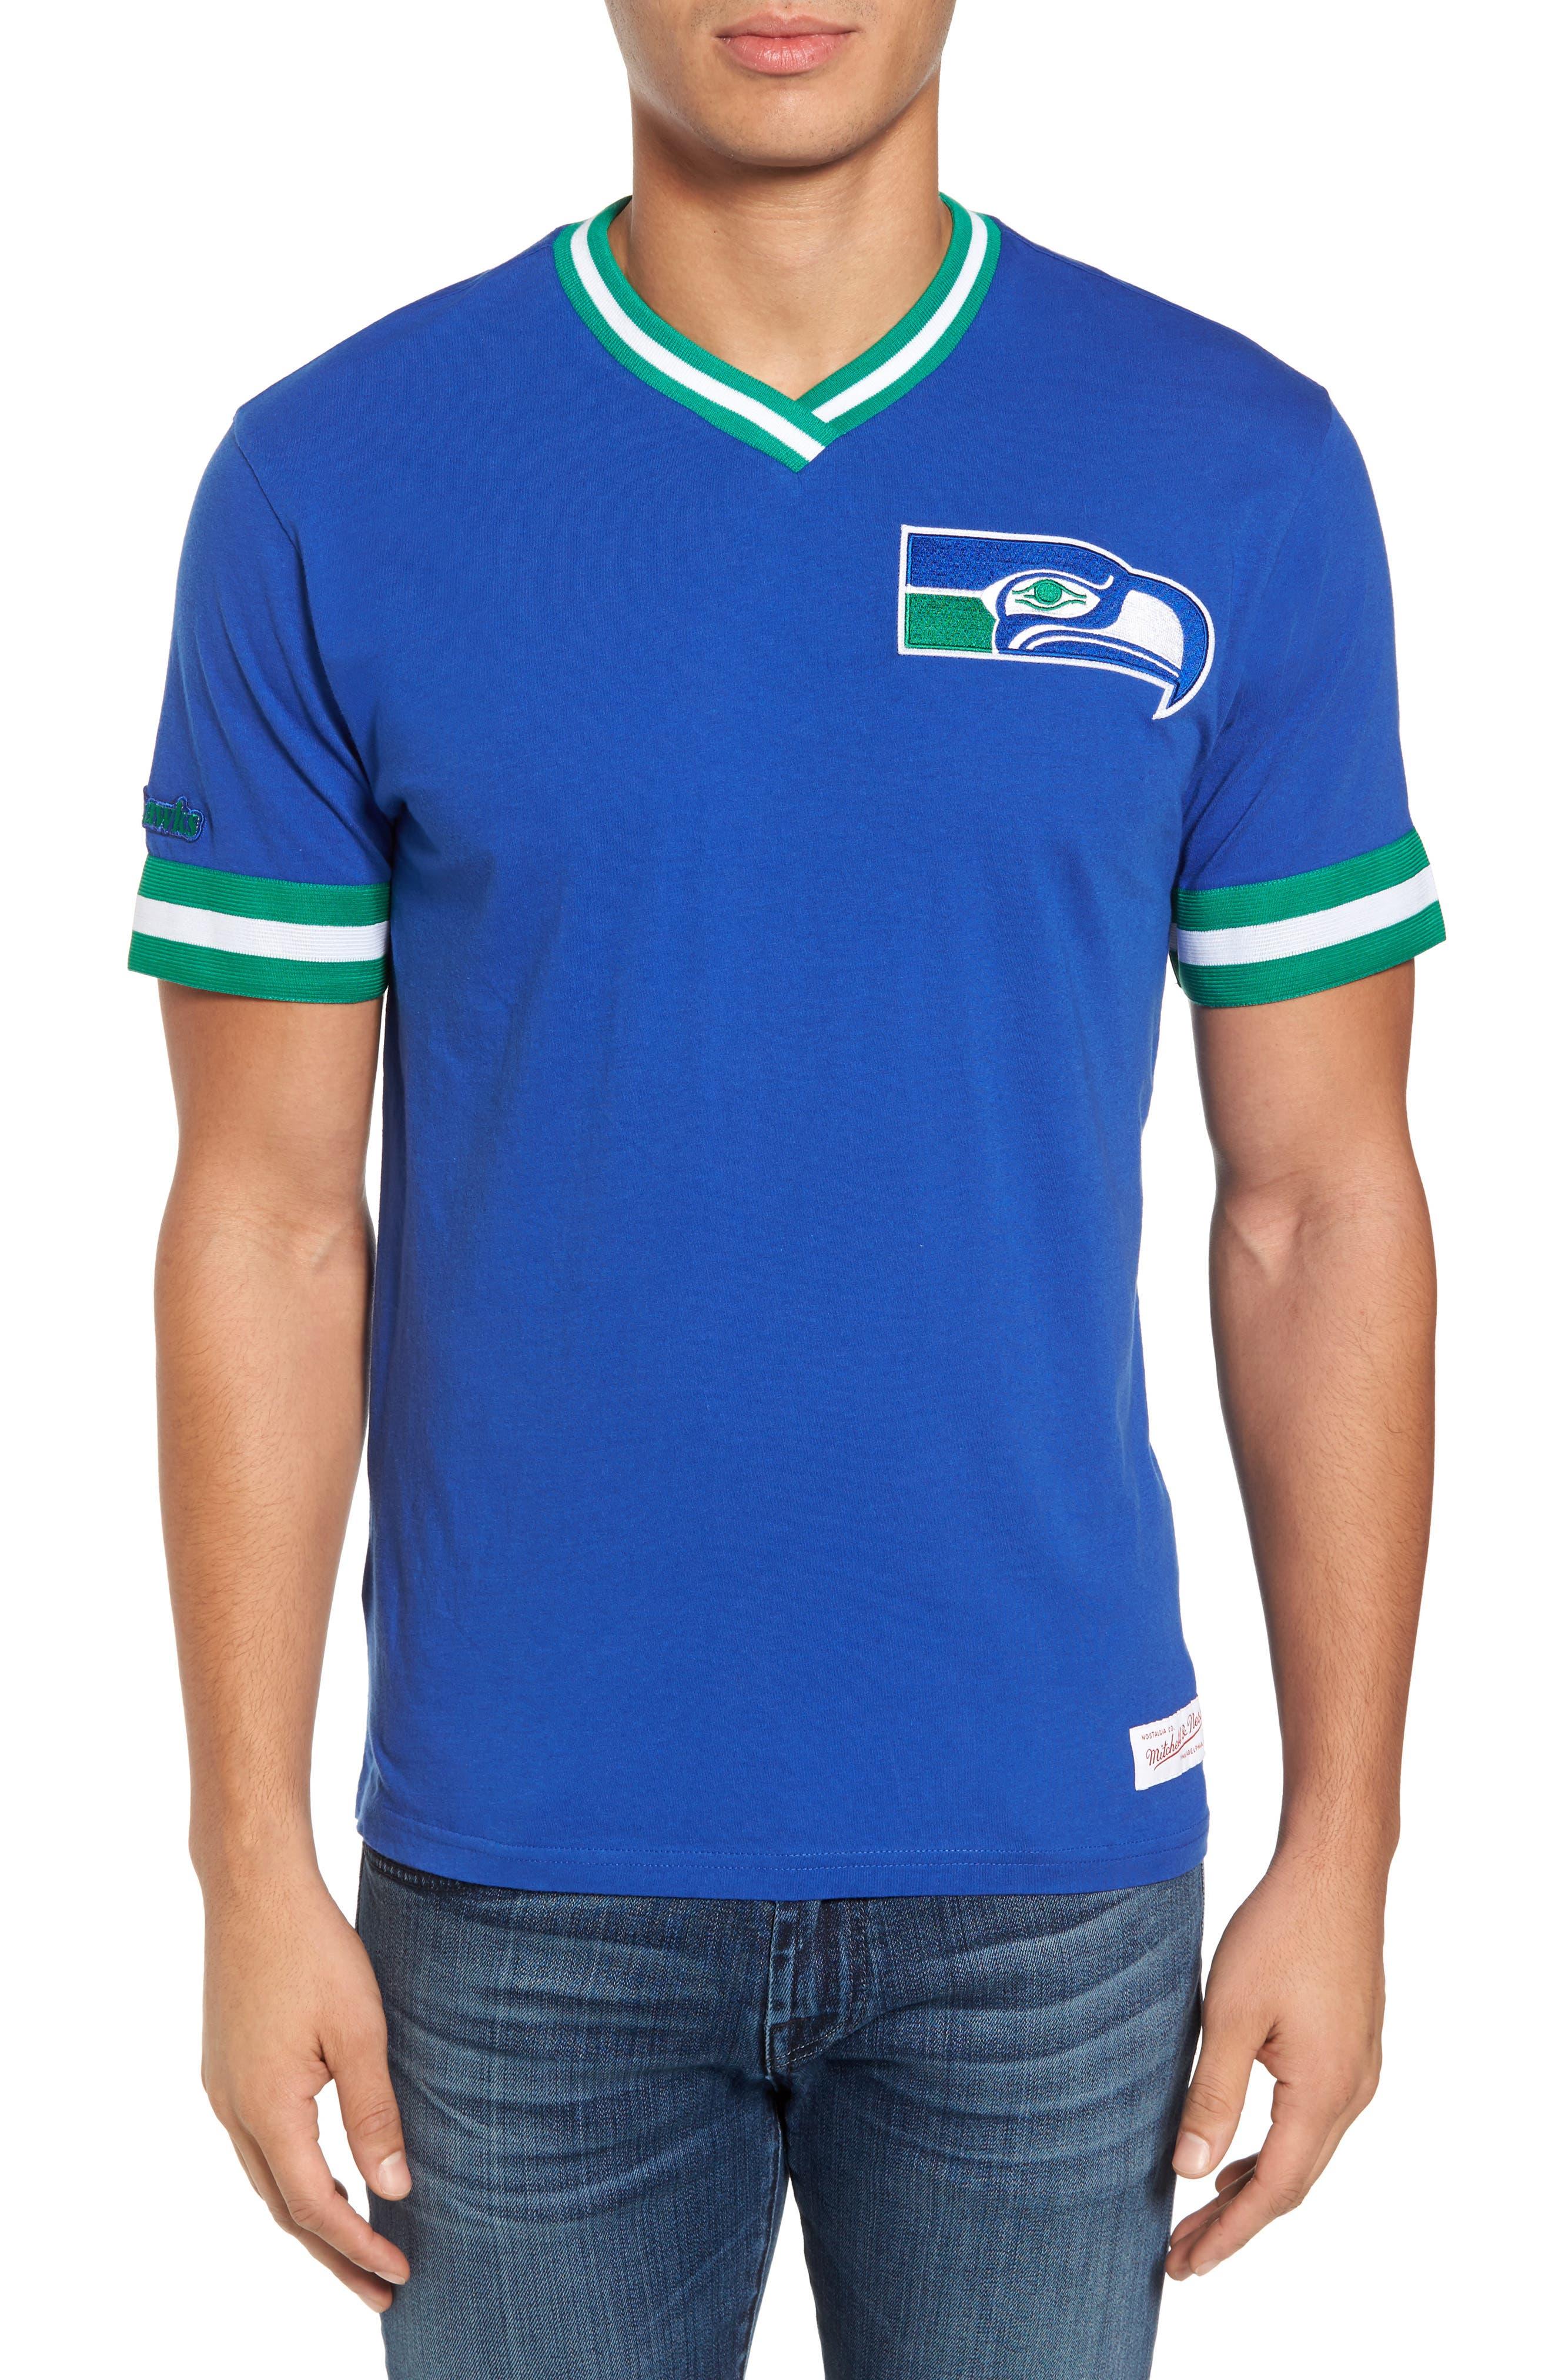 Mitchell & Ness NFL Seahawks T-Shirt